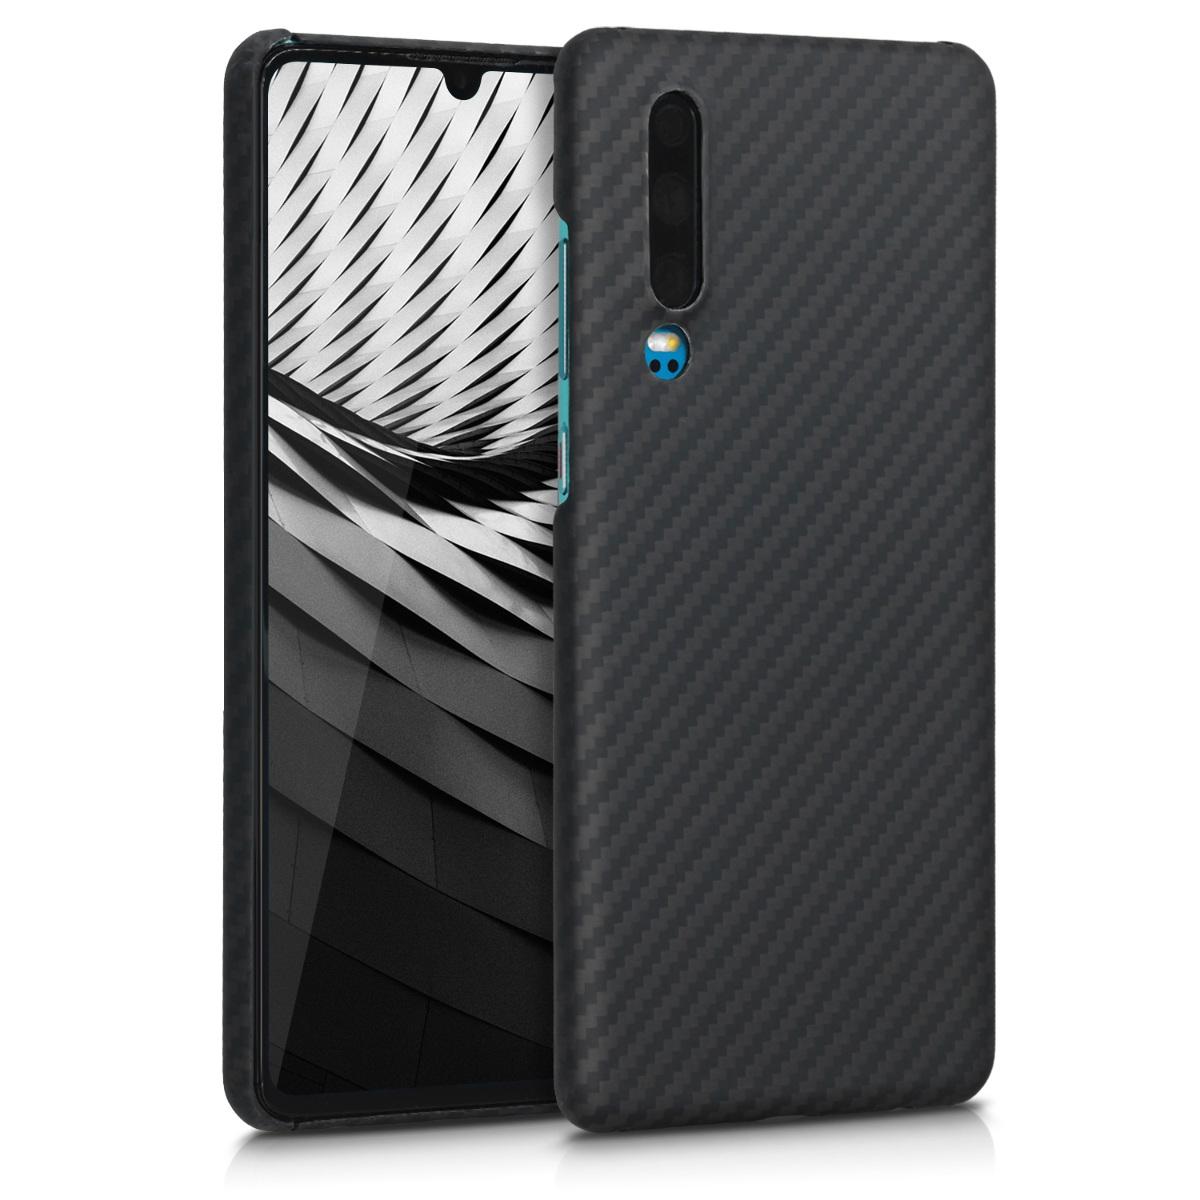 Kalibri Aramid Fiber Body - Σκληρή Θήκη Huawei P30 - Black Matte (49214.47)